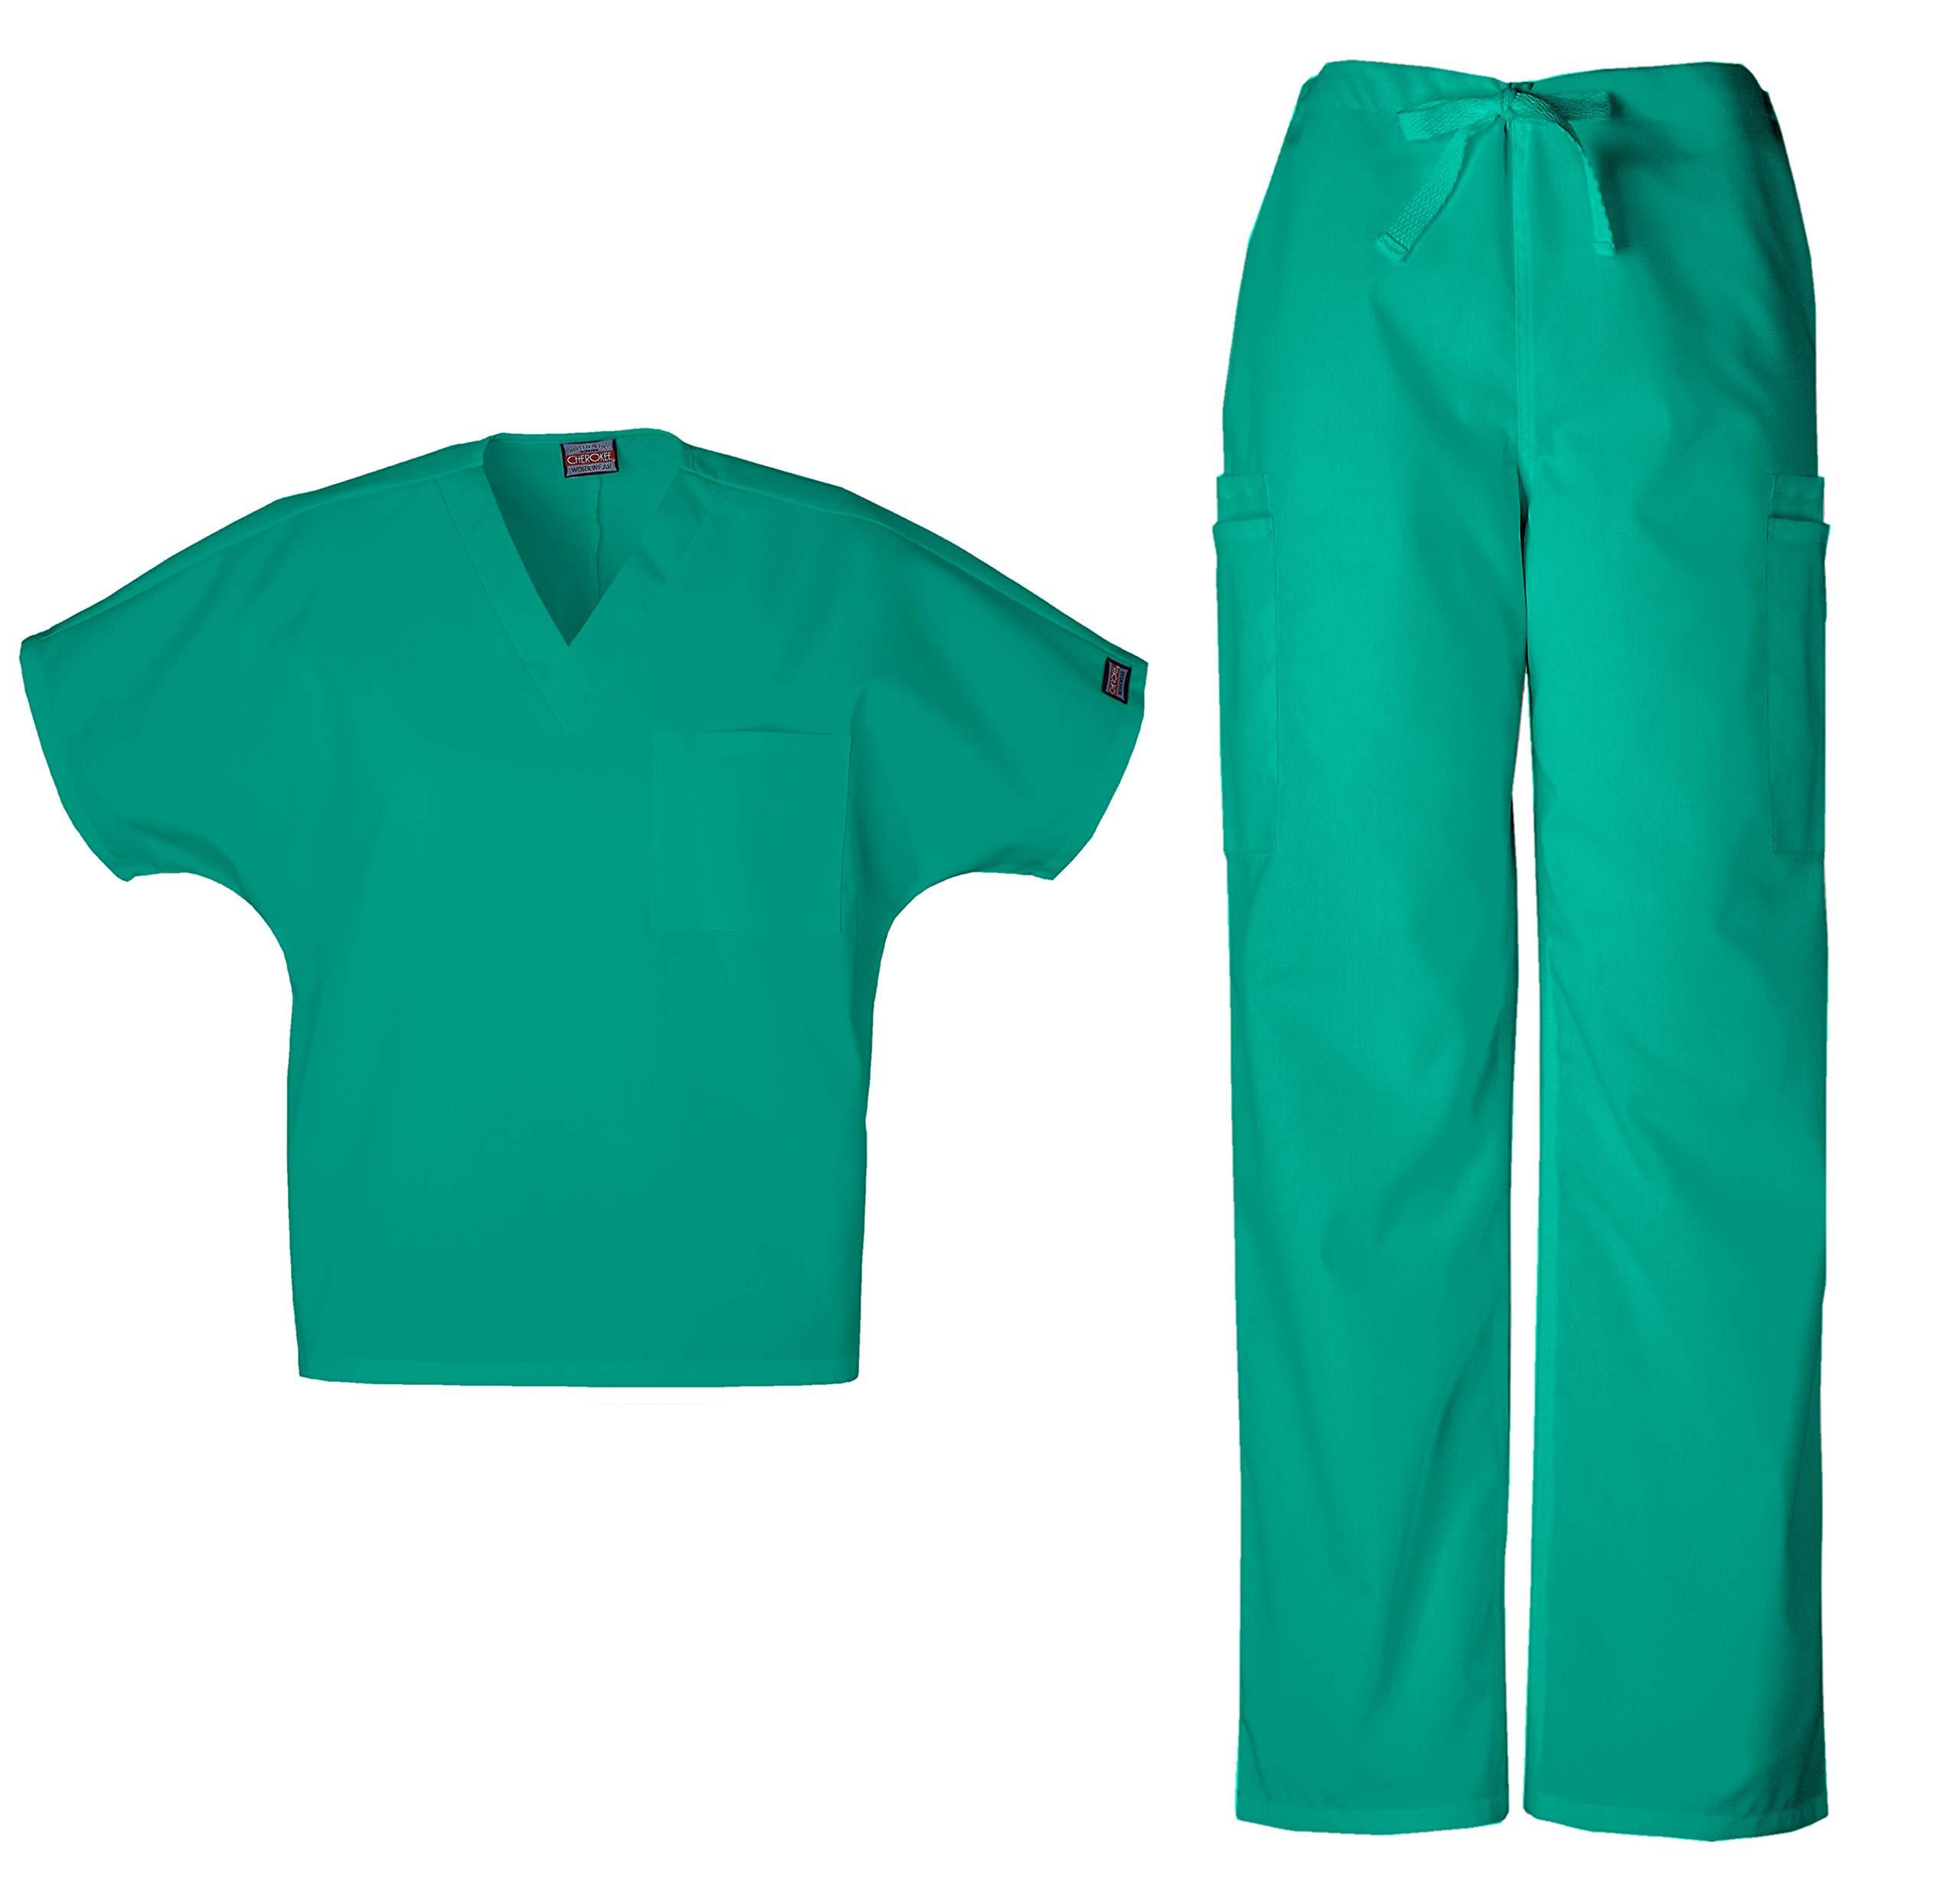 Cherokee Workwear Men's Dental/Medical Uniform Scrub Set - 4777 V-Neck Scrub Top & 4000 Drawstring Cargo Pants (Surgical Green - Large/Large) by Cherokee